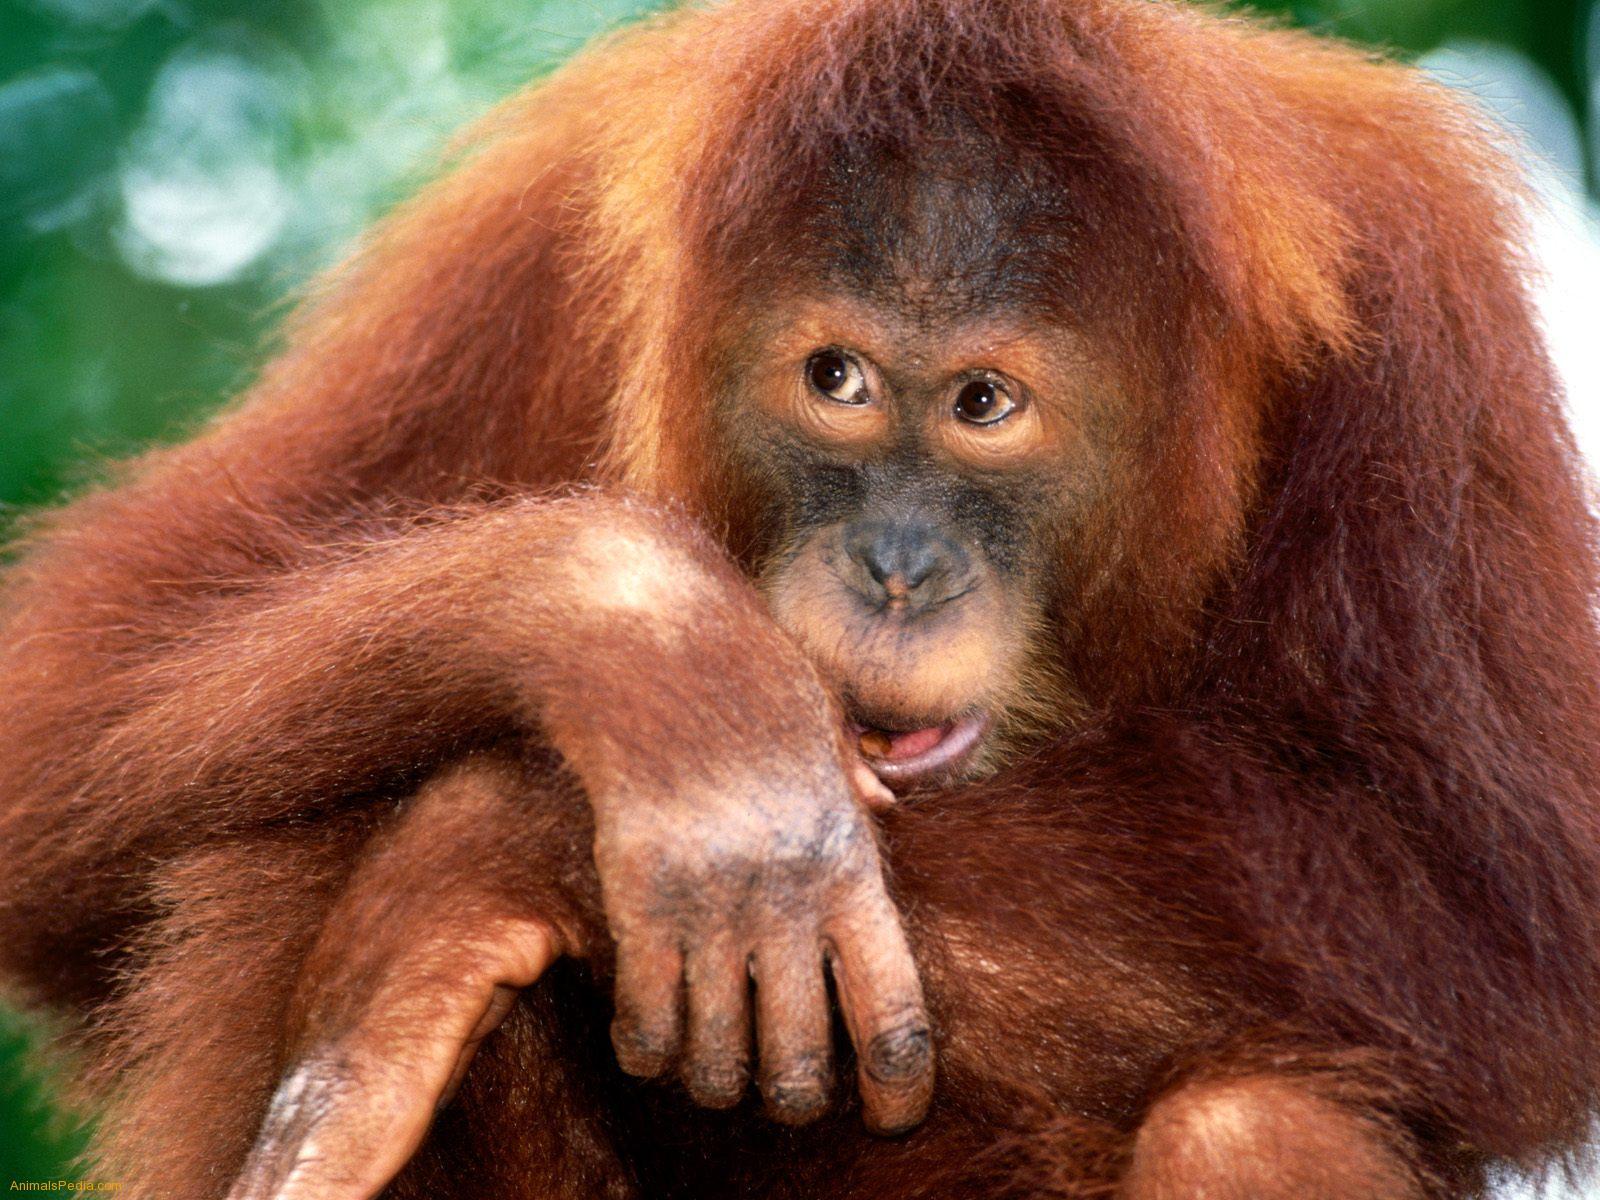 Sumatran Orangutan Baby From encyclopedia of babies of